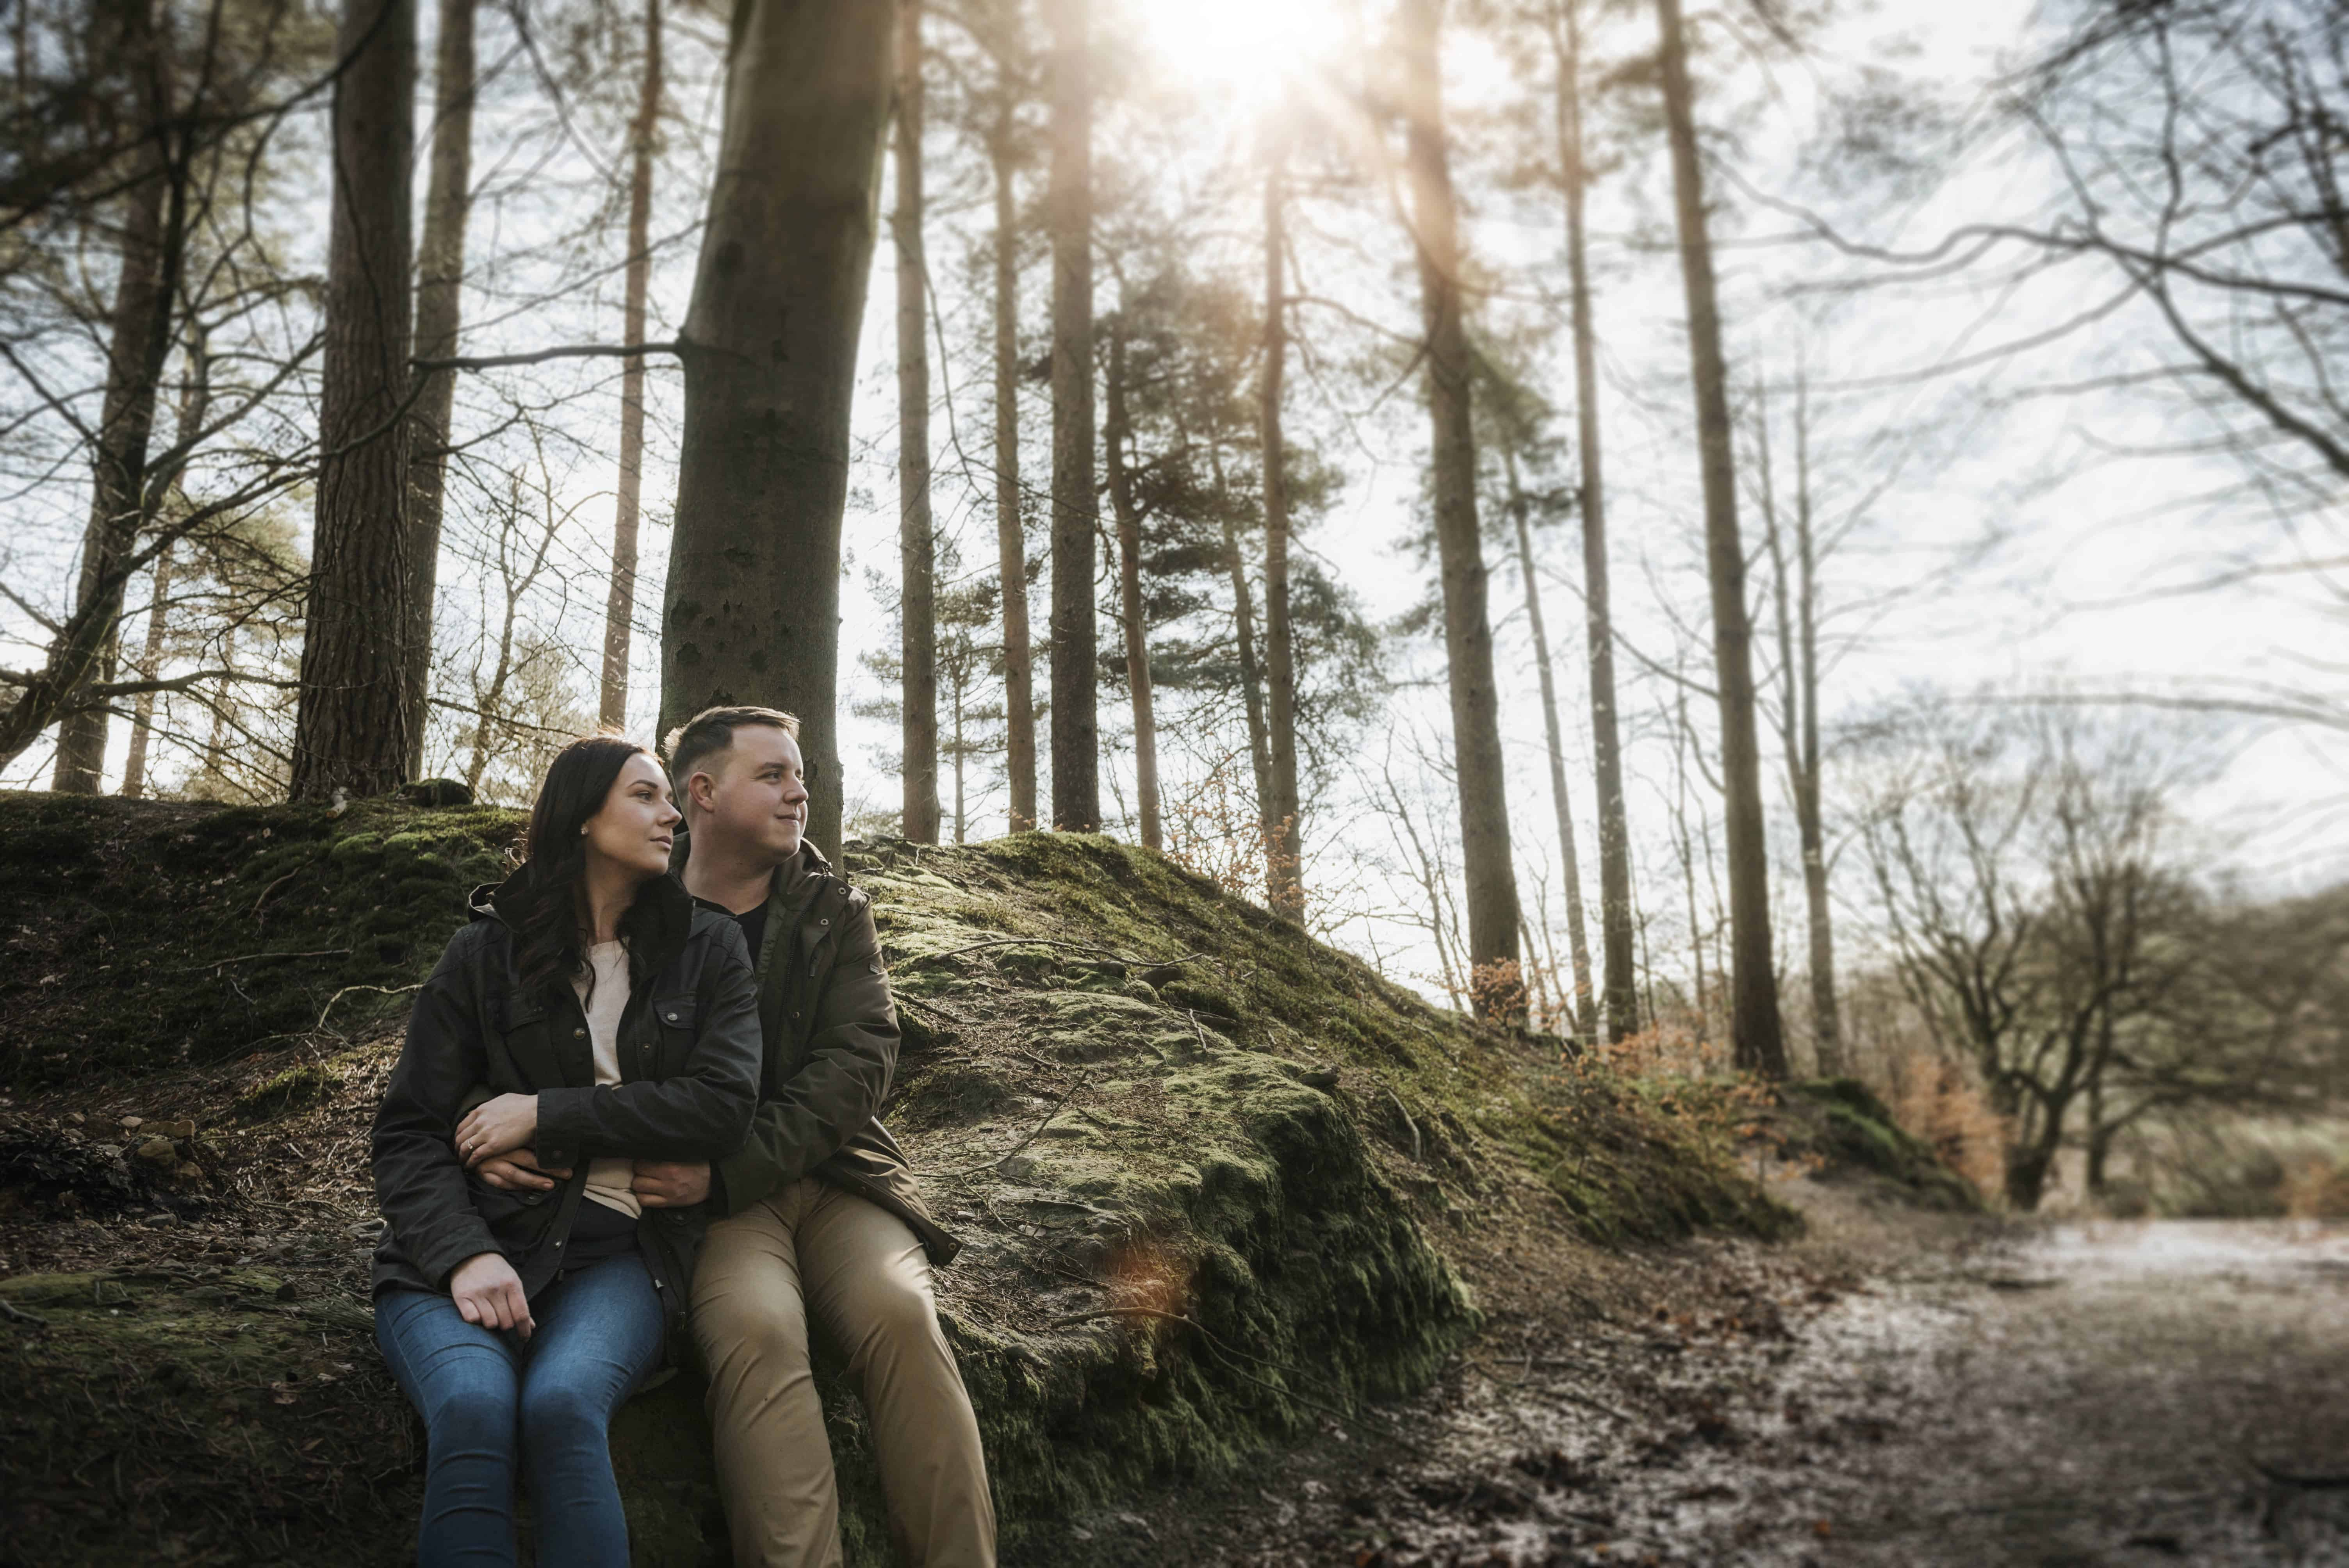 blaen bran community walk - Couple sat on tree stump with sun shining